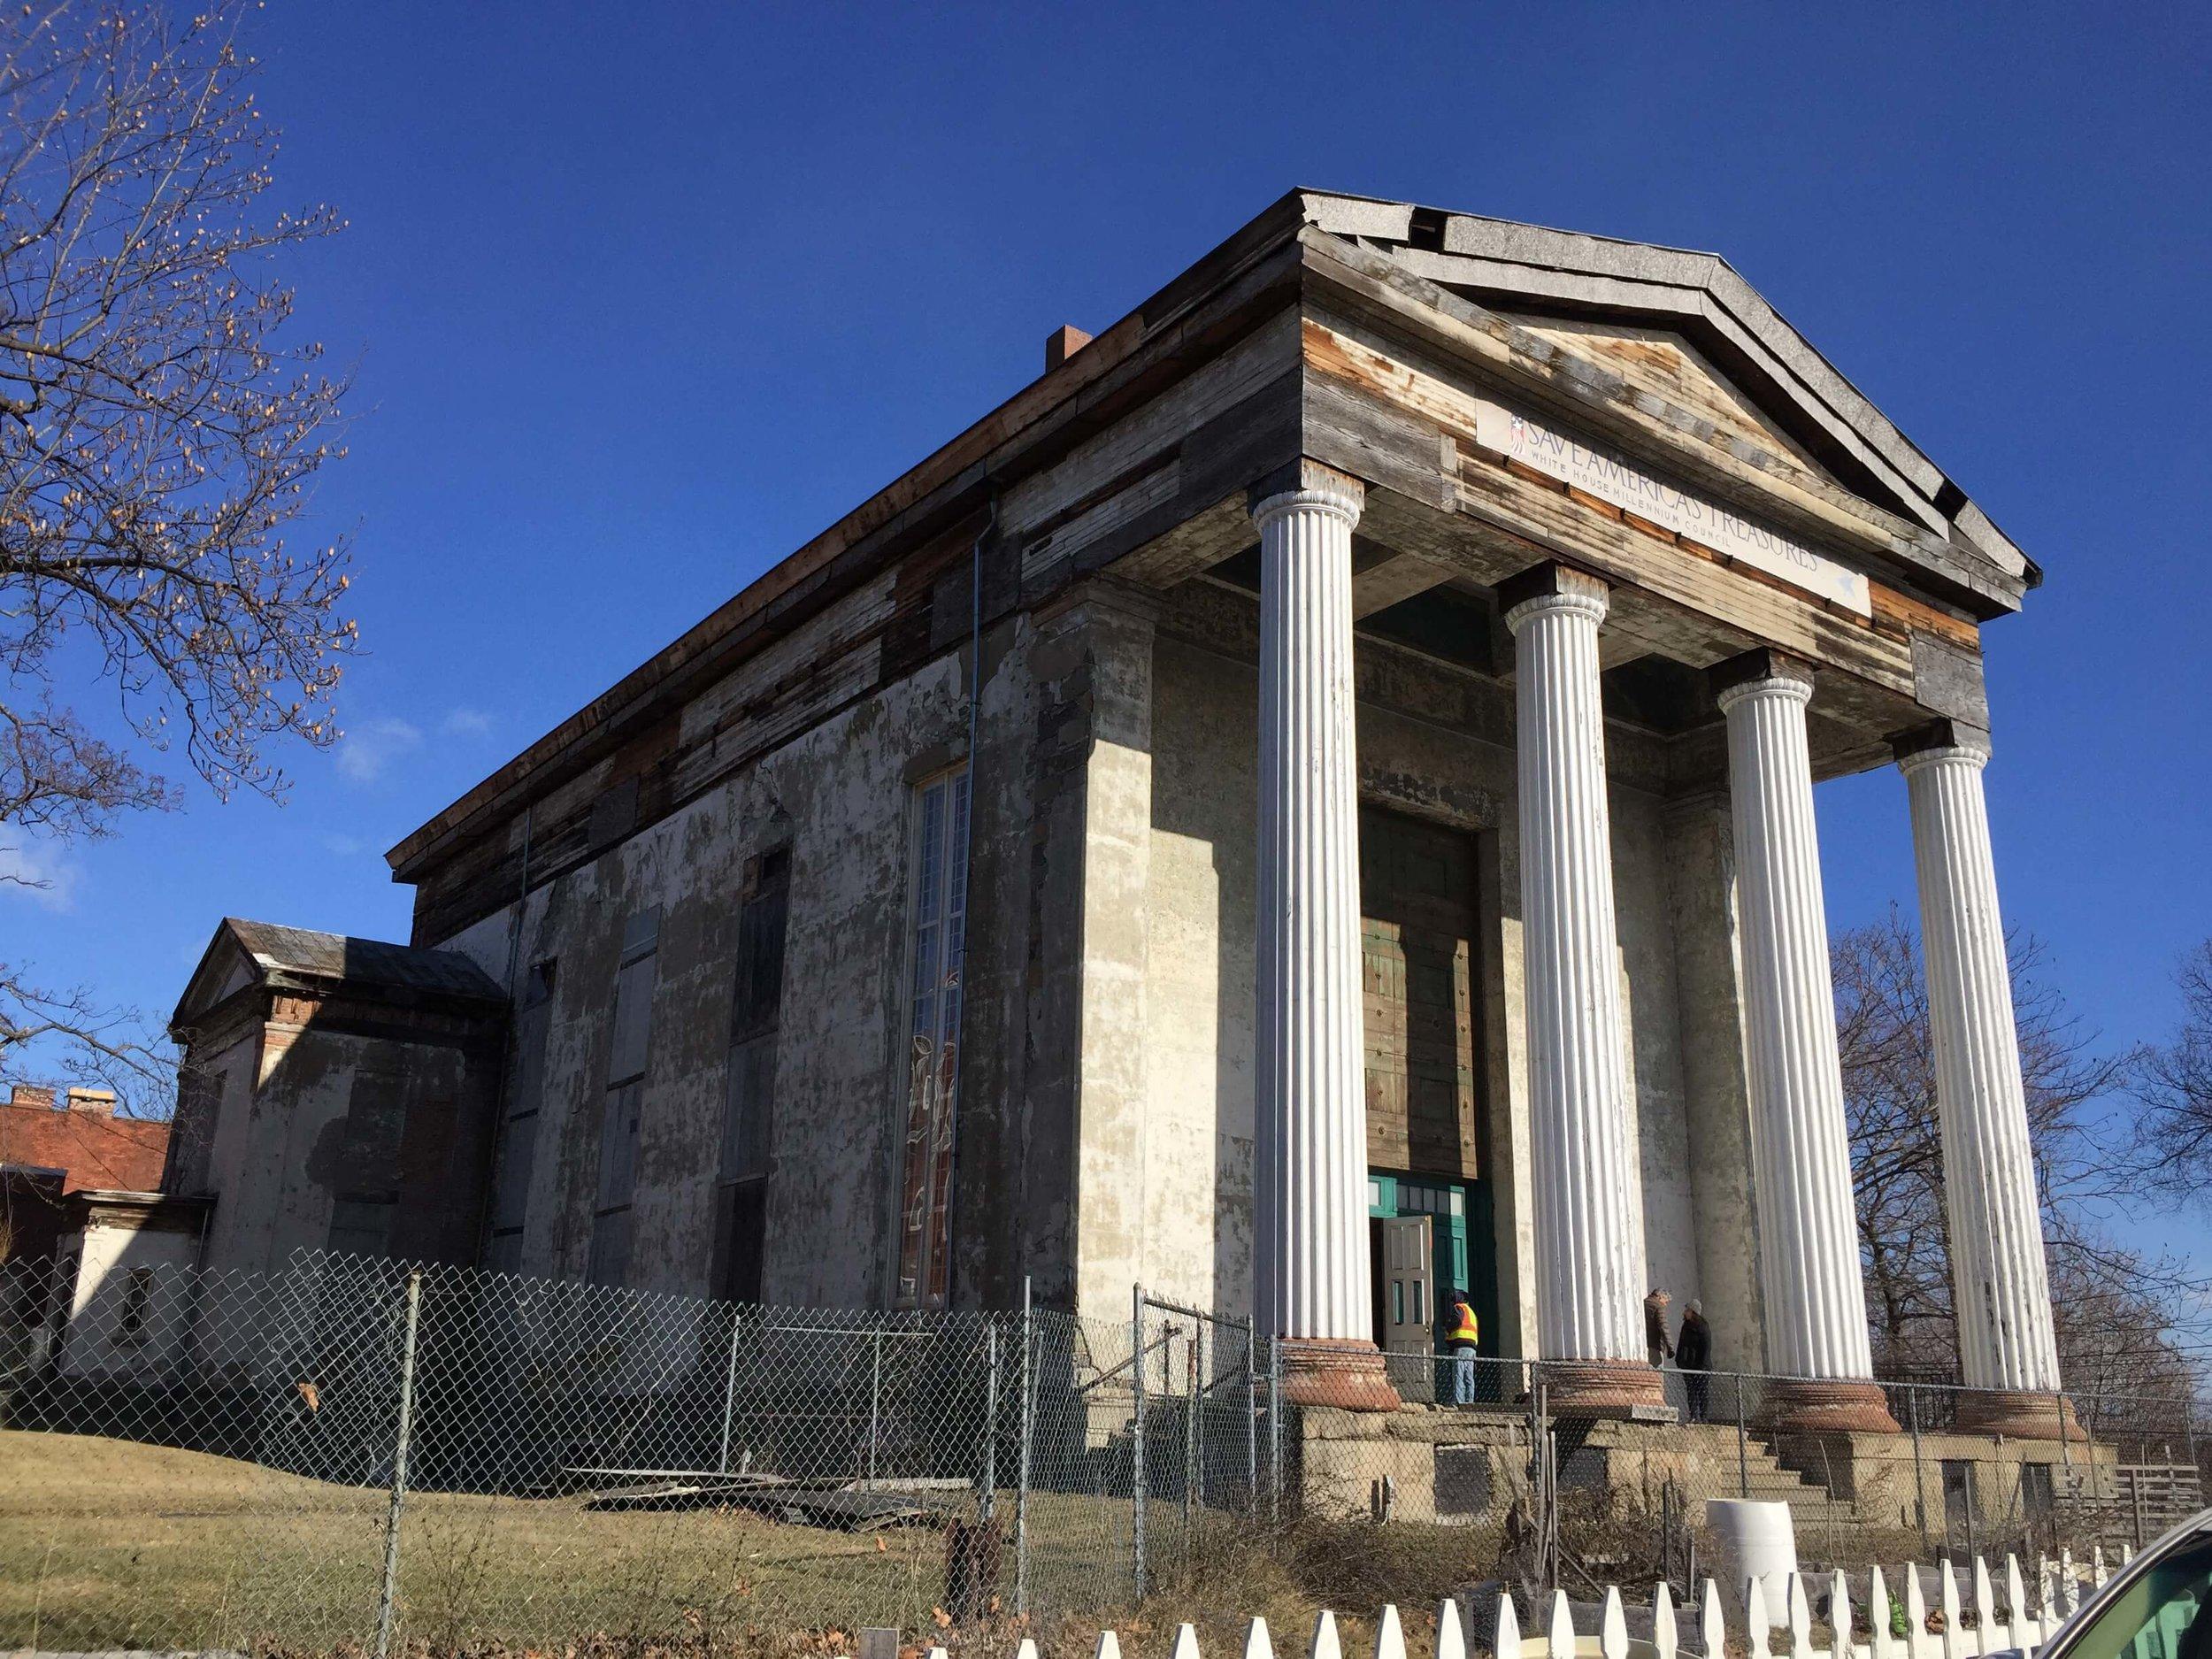 Dutch Reformed Church - Exterior.JPG